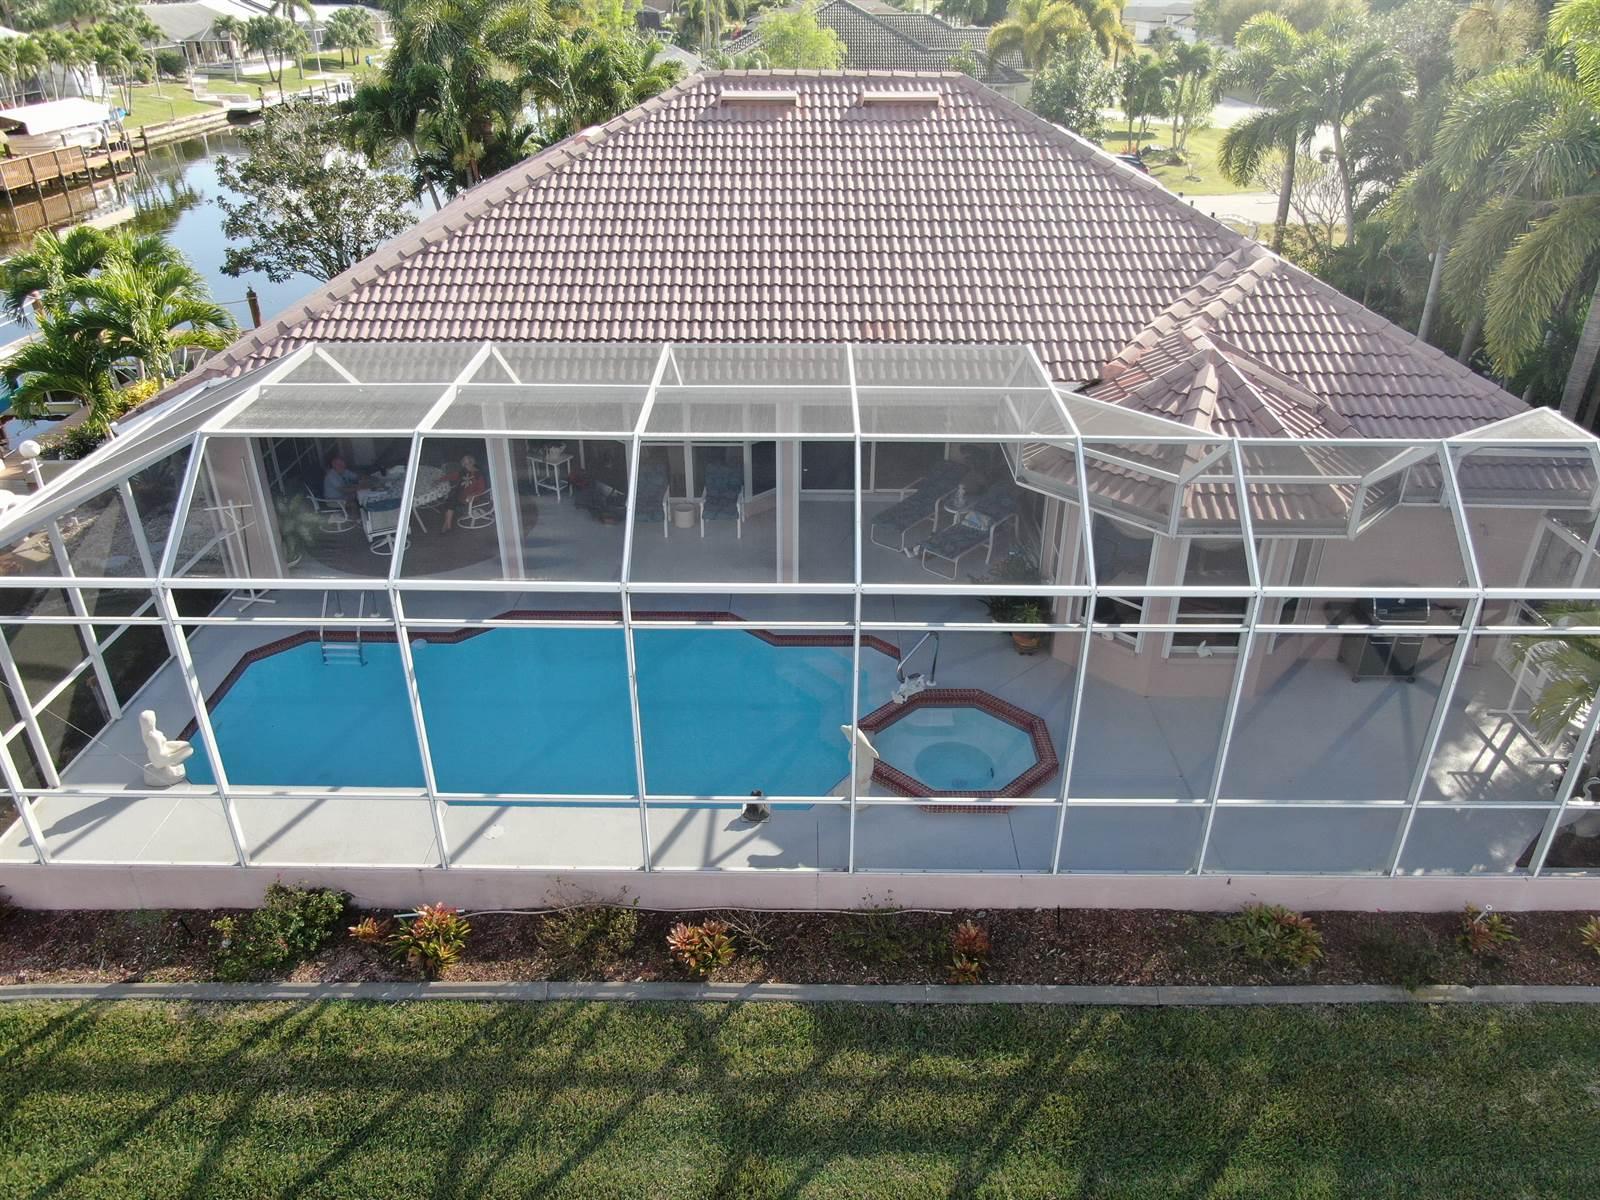 419 SE 33rd Terrace, Cape Coral, FL 33904